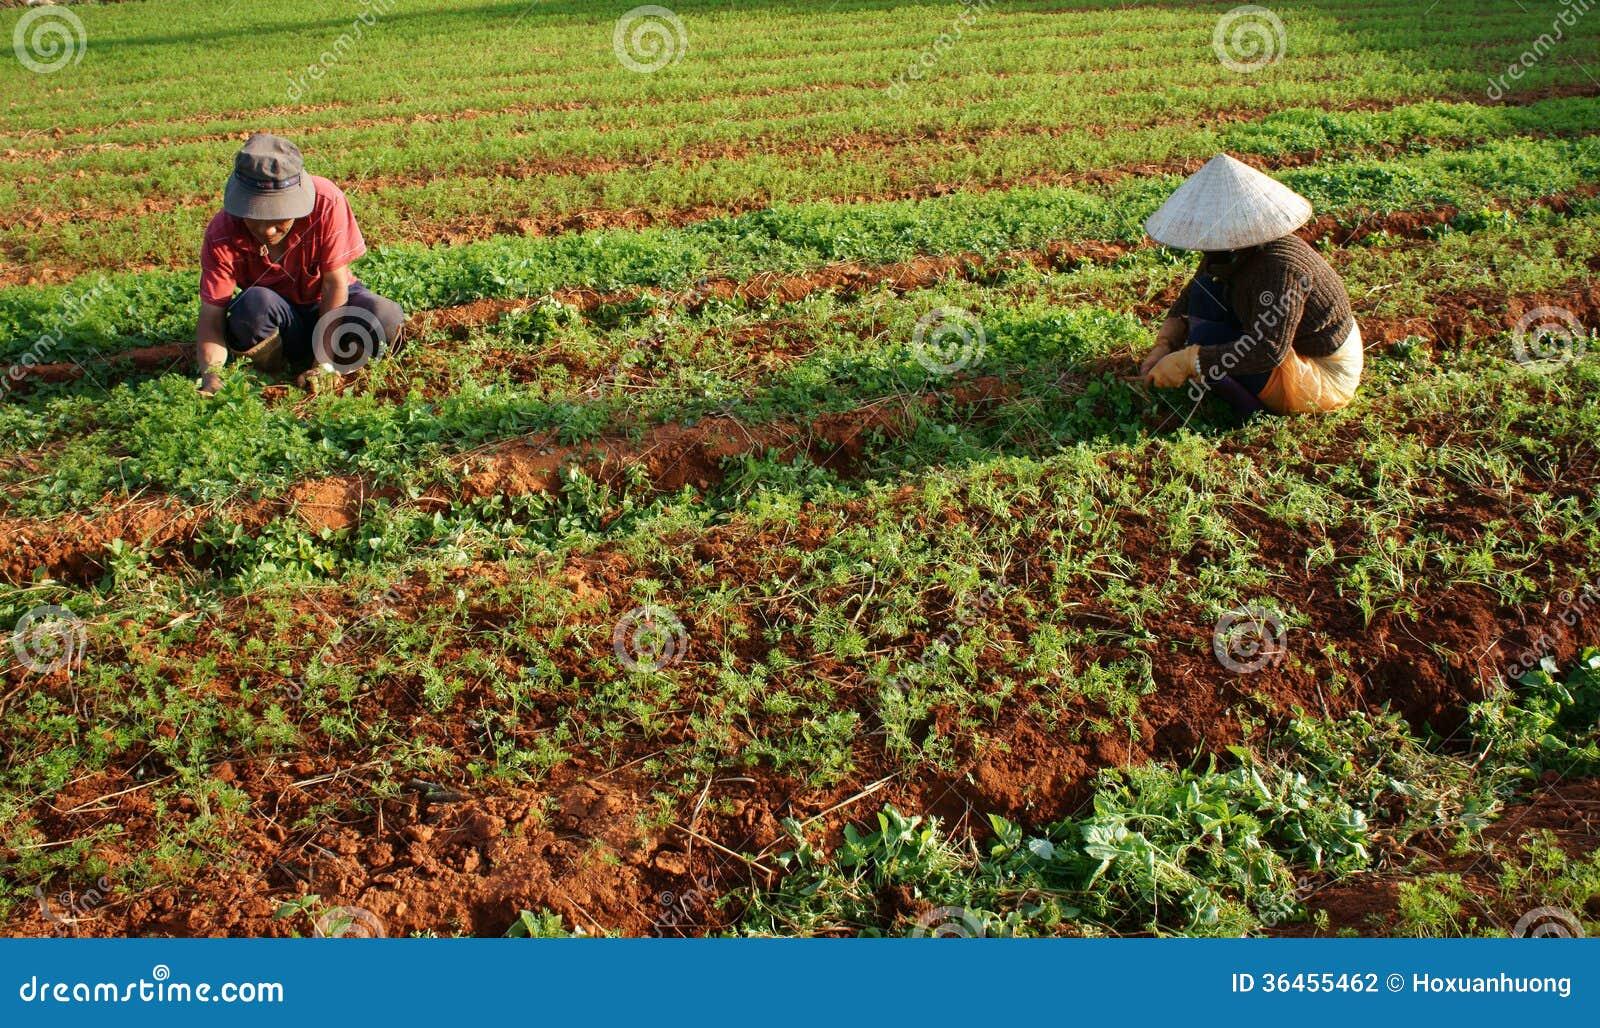 Seasonal Farm Work